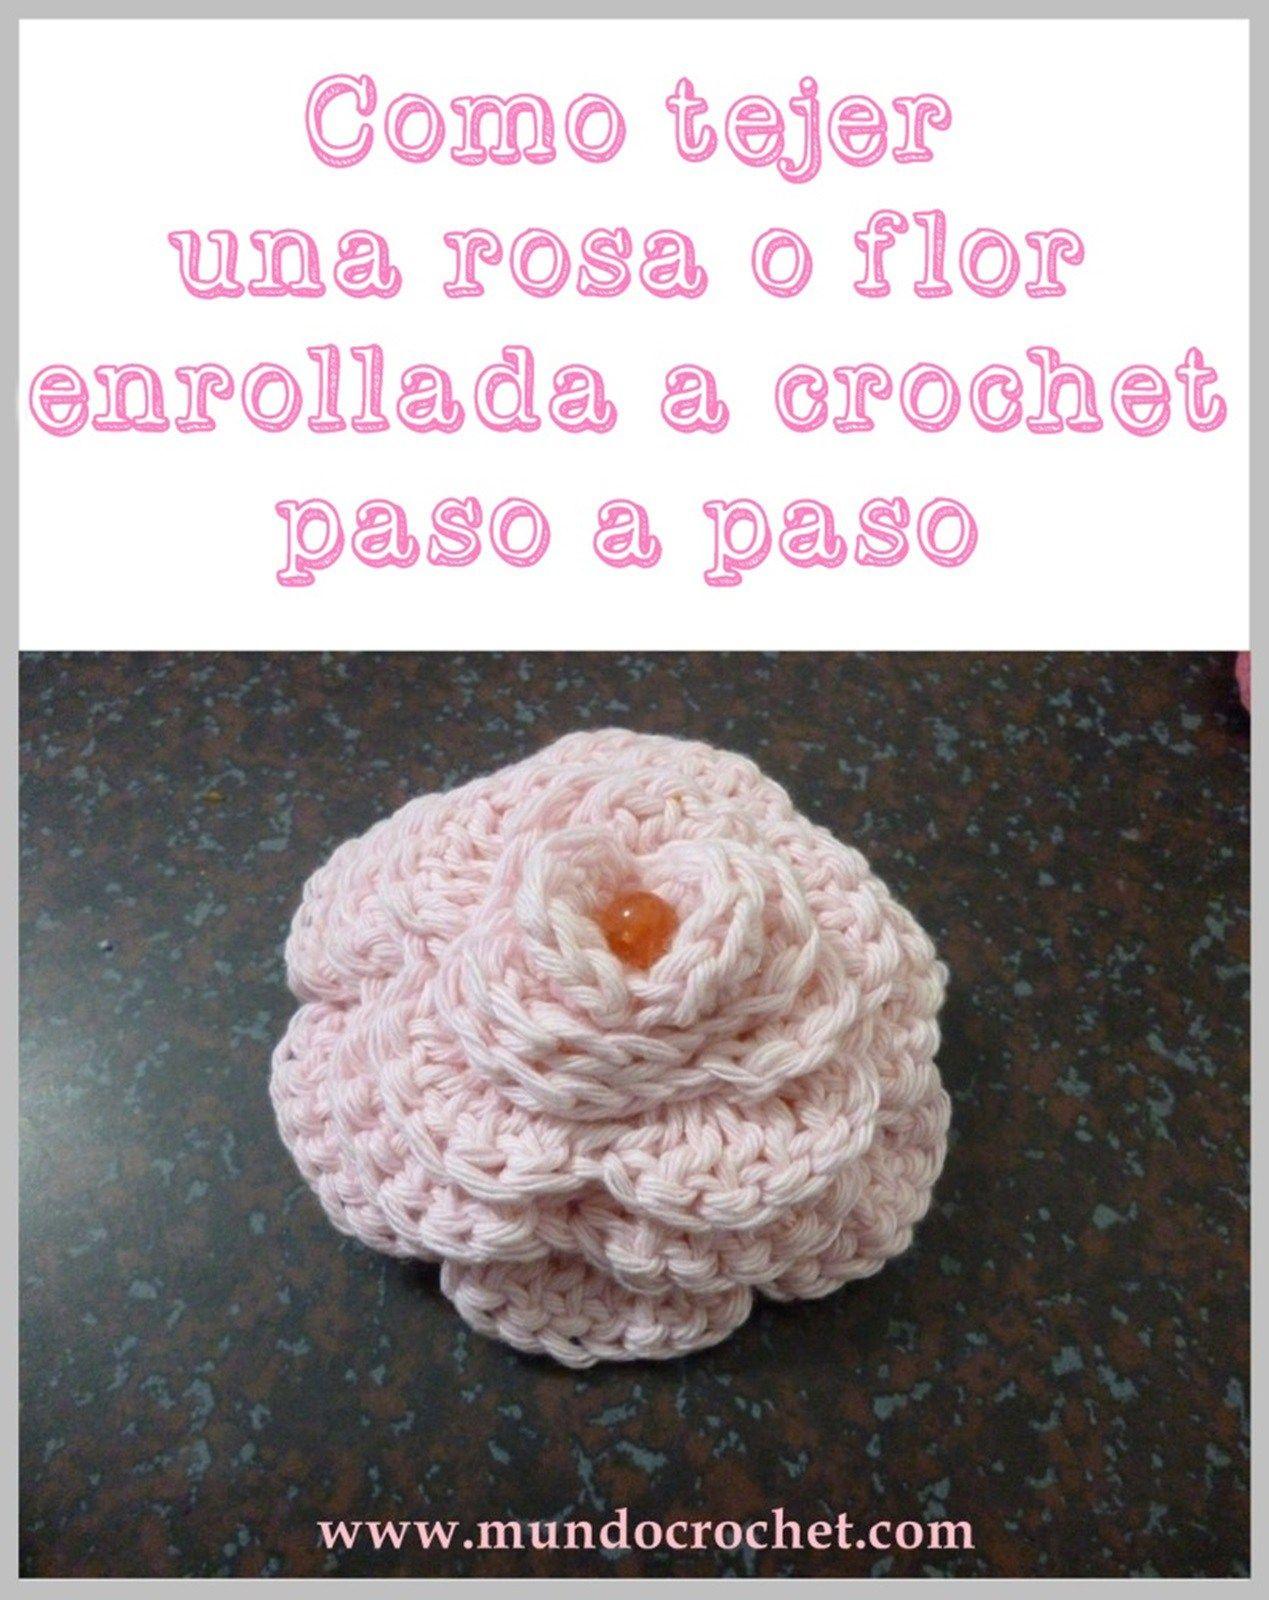 Como tejer una rosa o flor enrollada crochet o ganchillo paso a paso ...